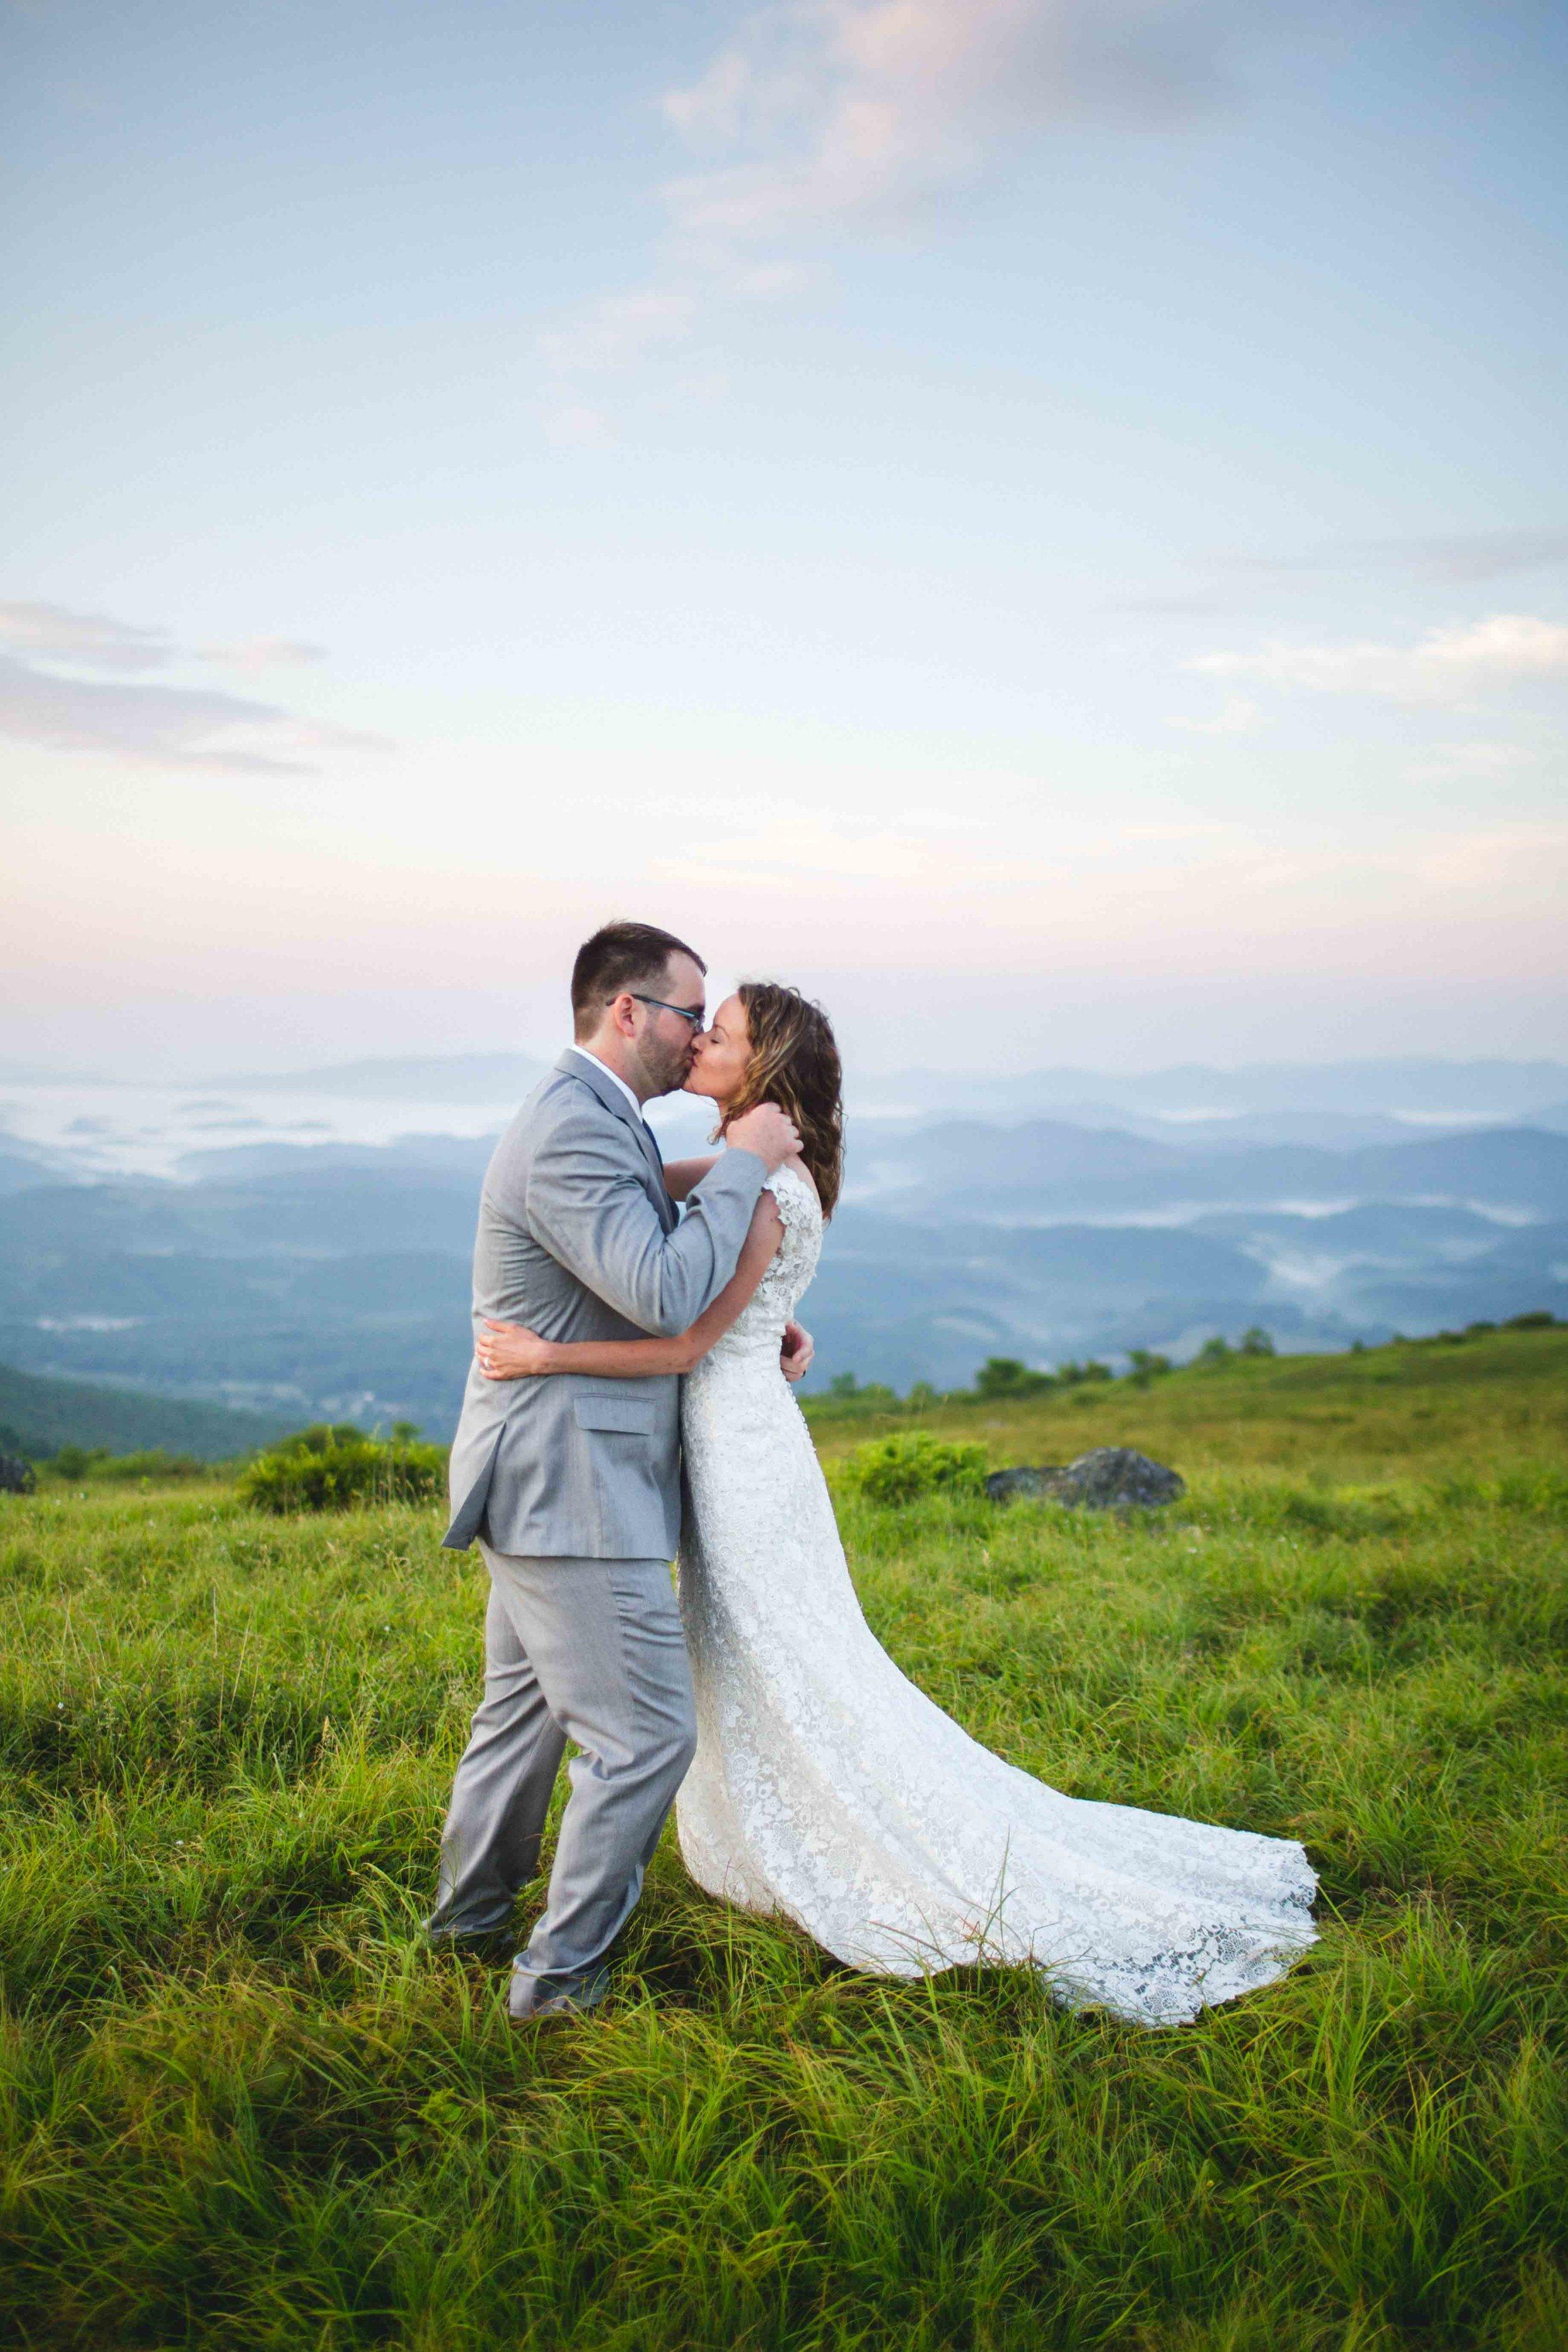 north-carolina-elopement-photographer-37.jpg